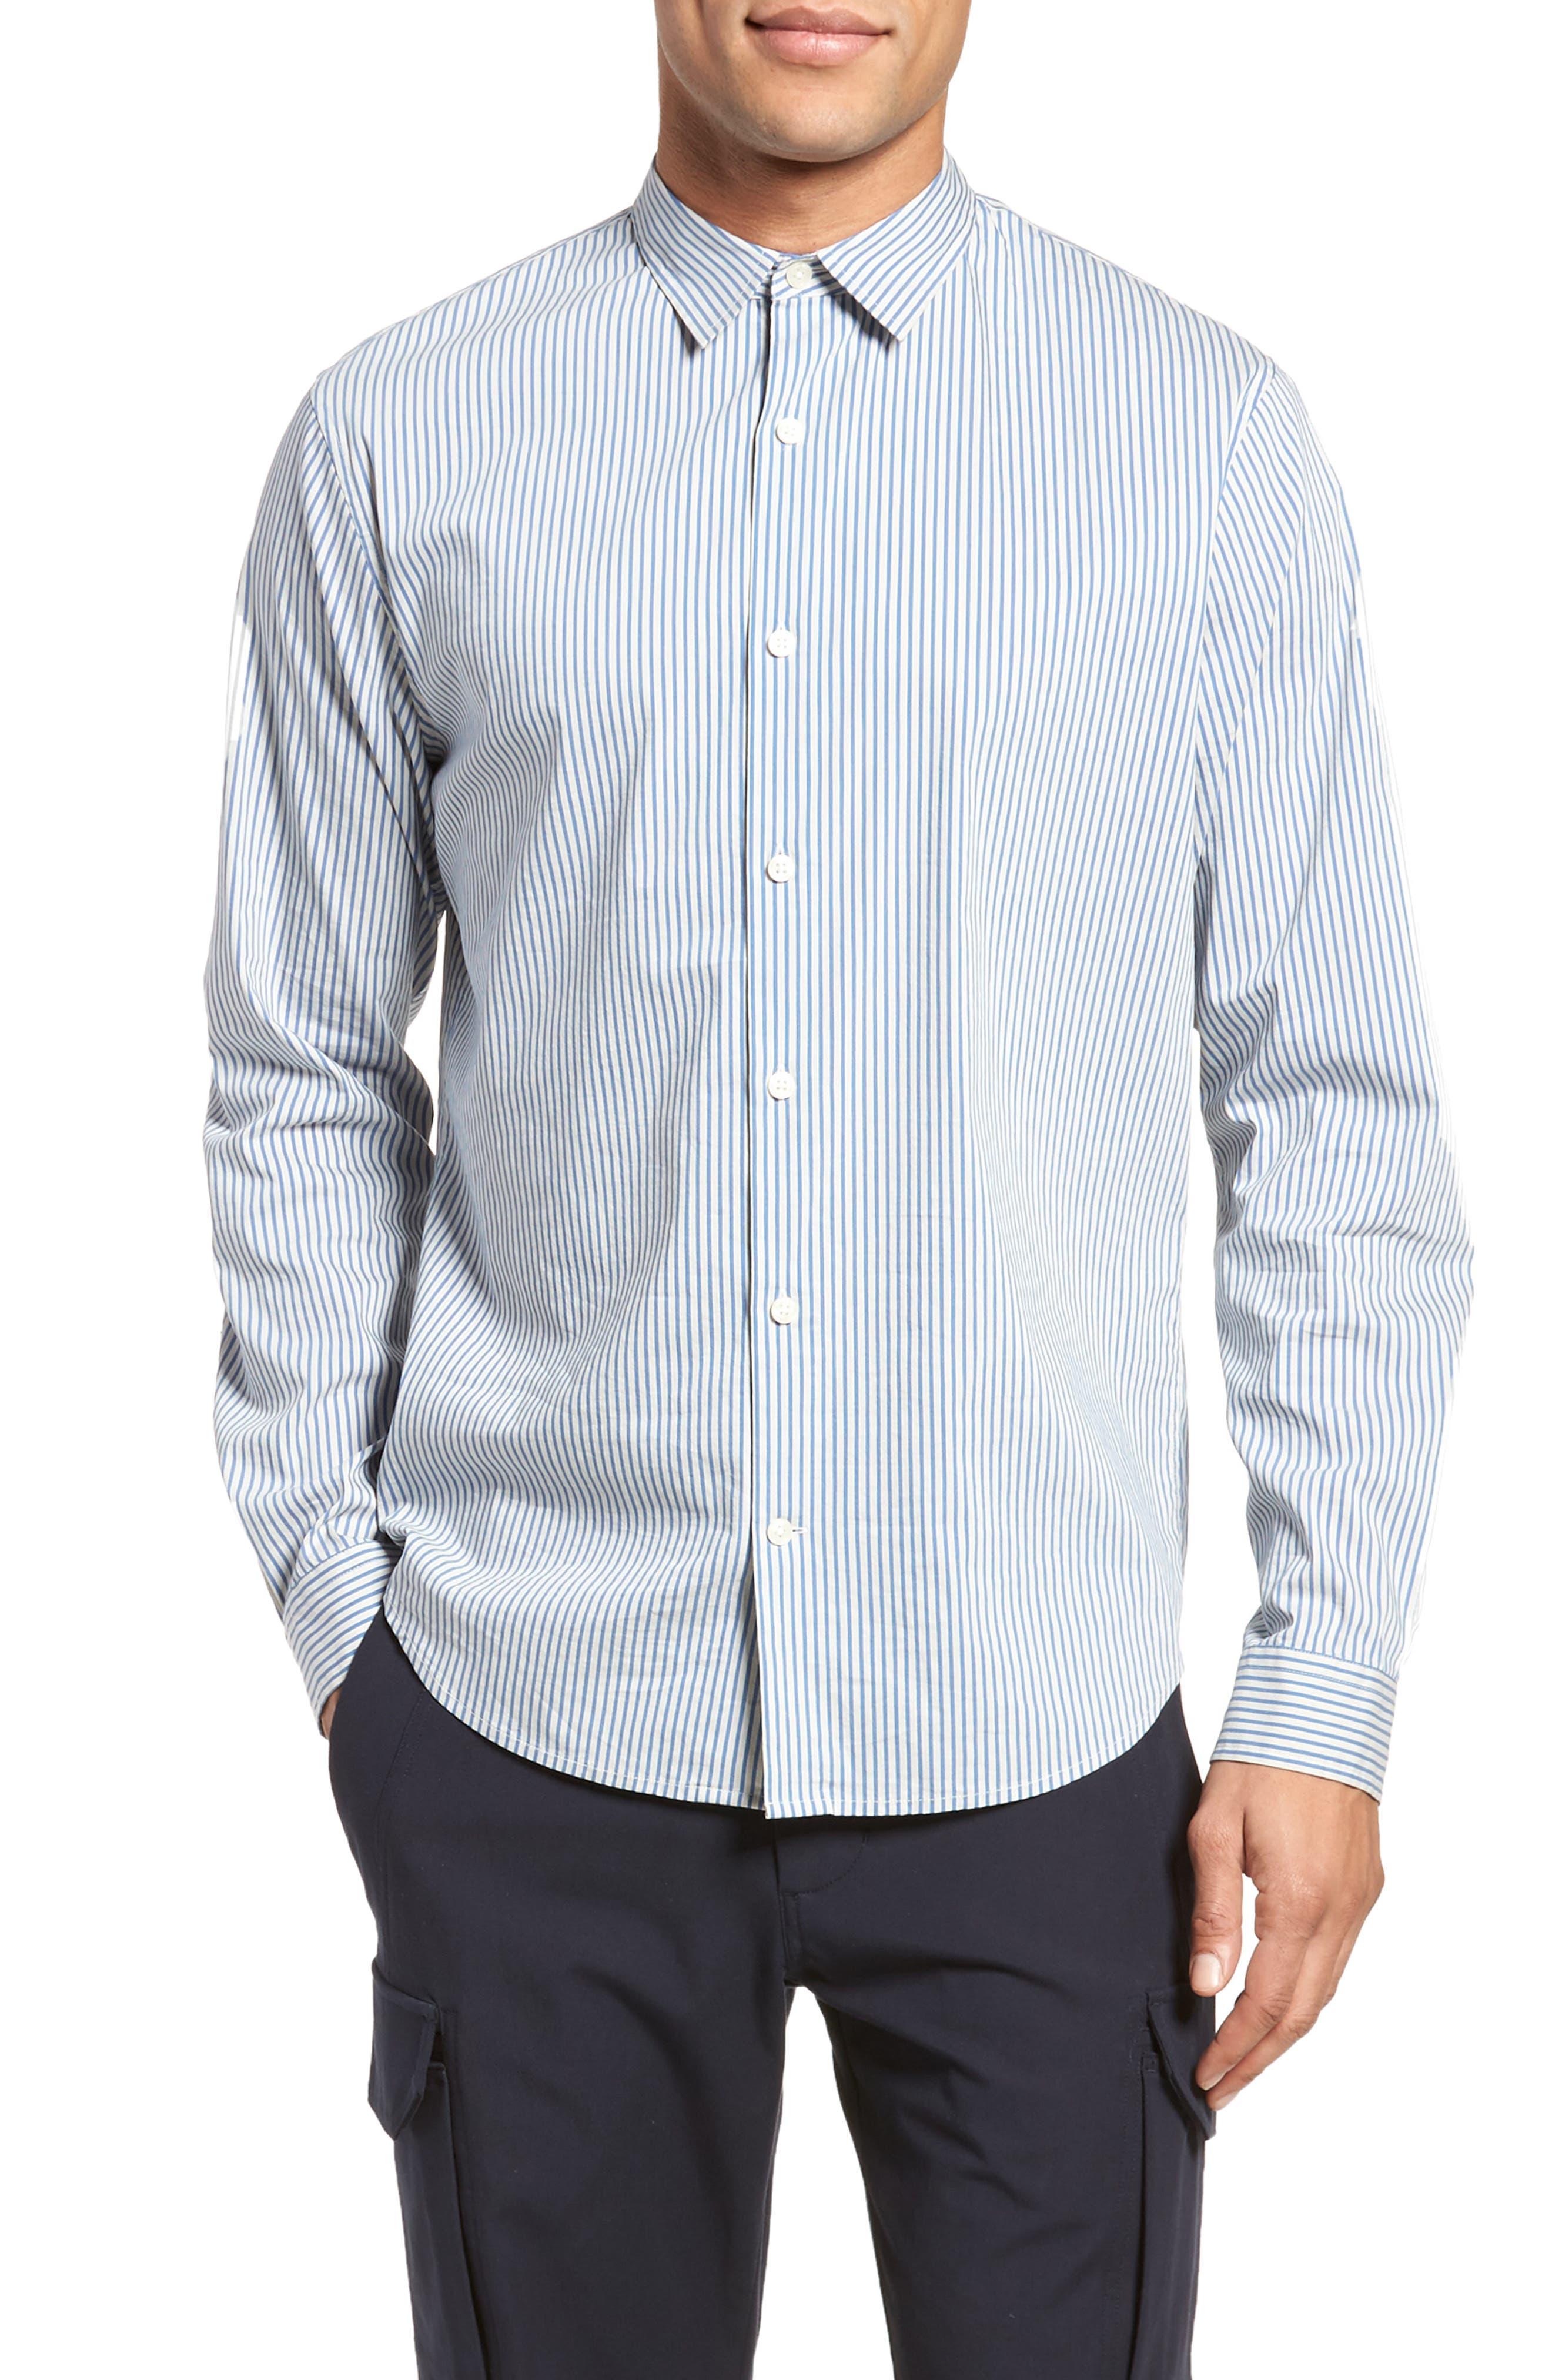 Regular Fit Stripe Sport Shirt,                         Main,                         color, 100